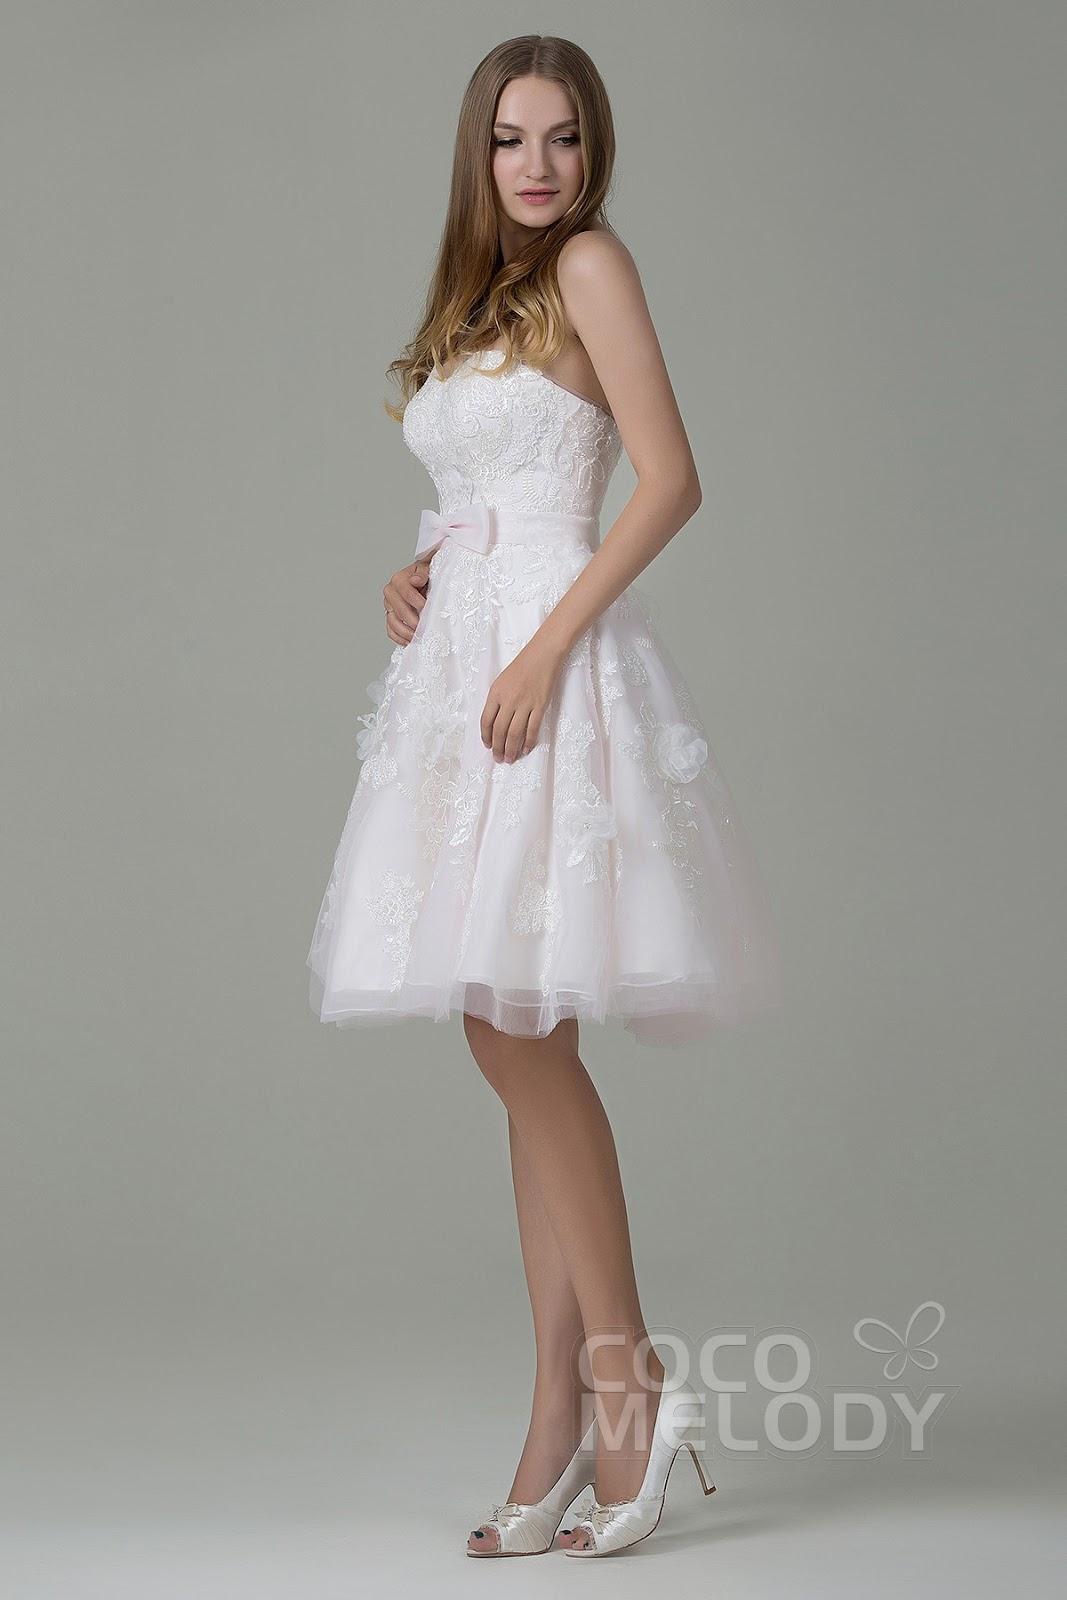 little girls flower girl dresses: Bustier wedding dress is often ...